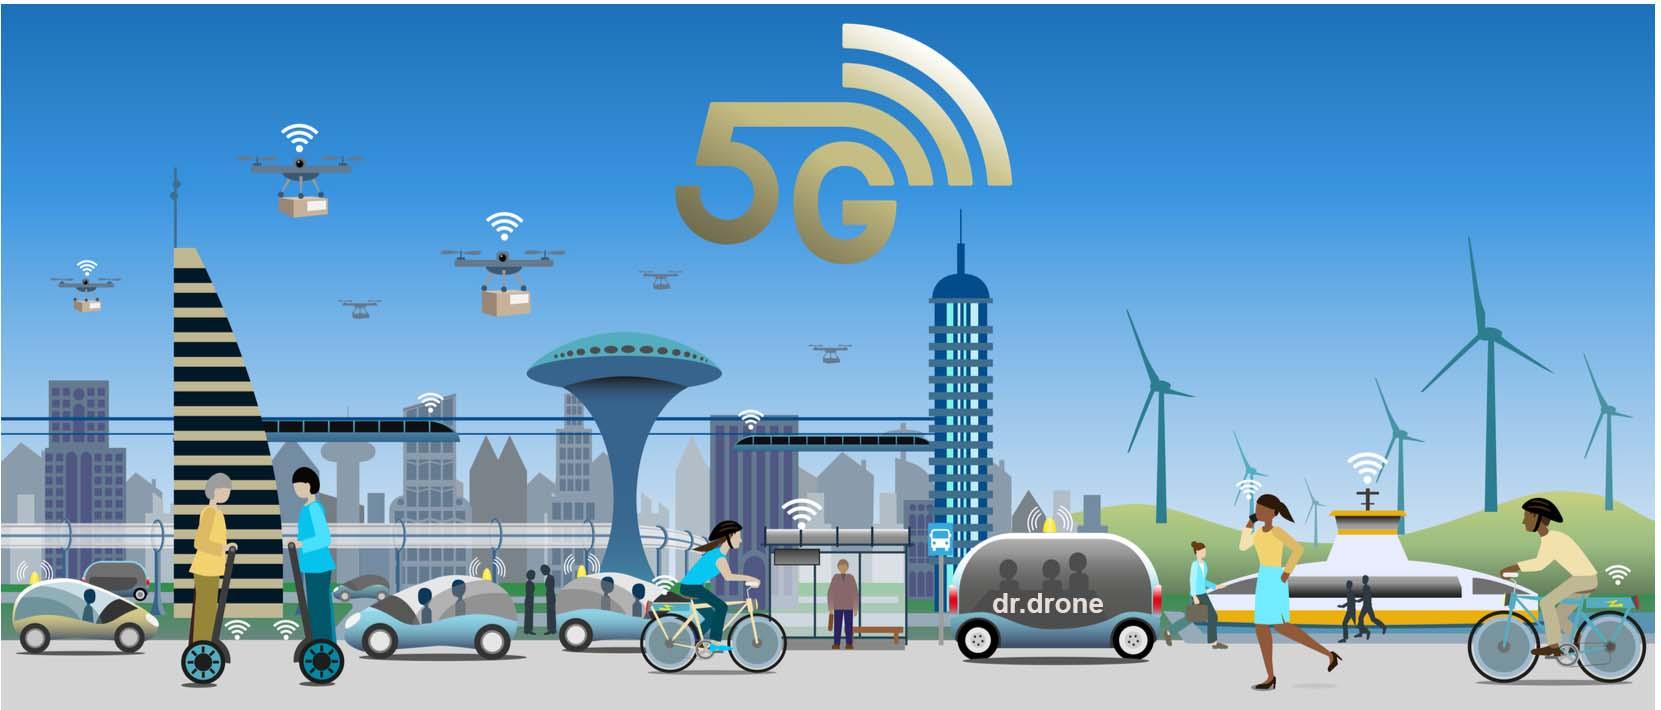 Drone 5G Wi-Fİ Kullanımı